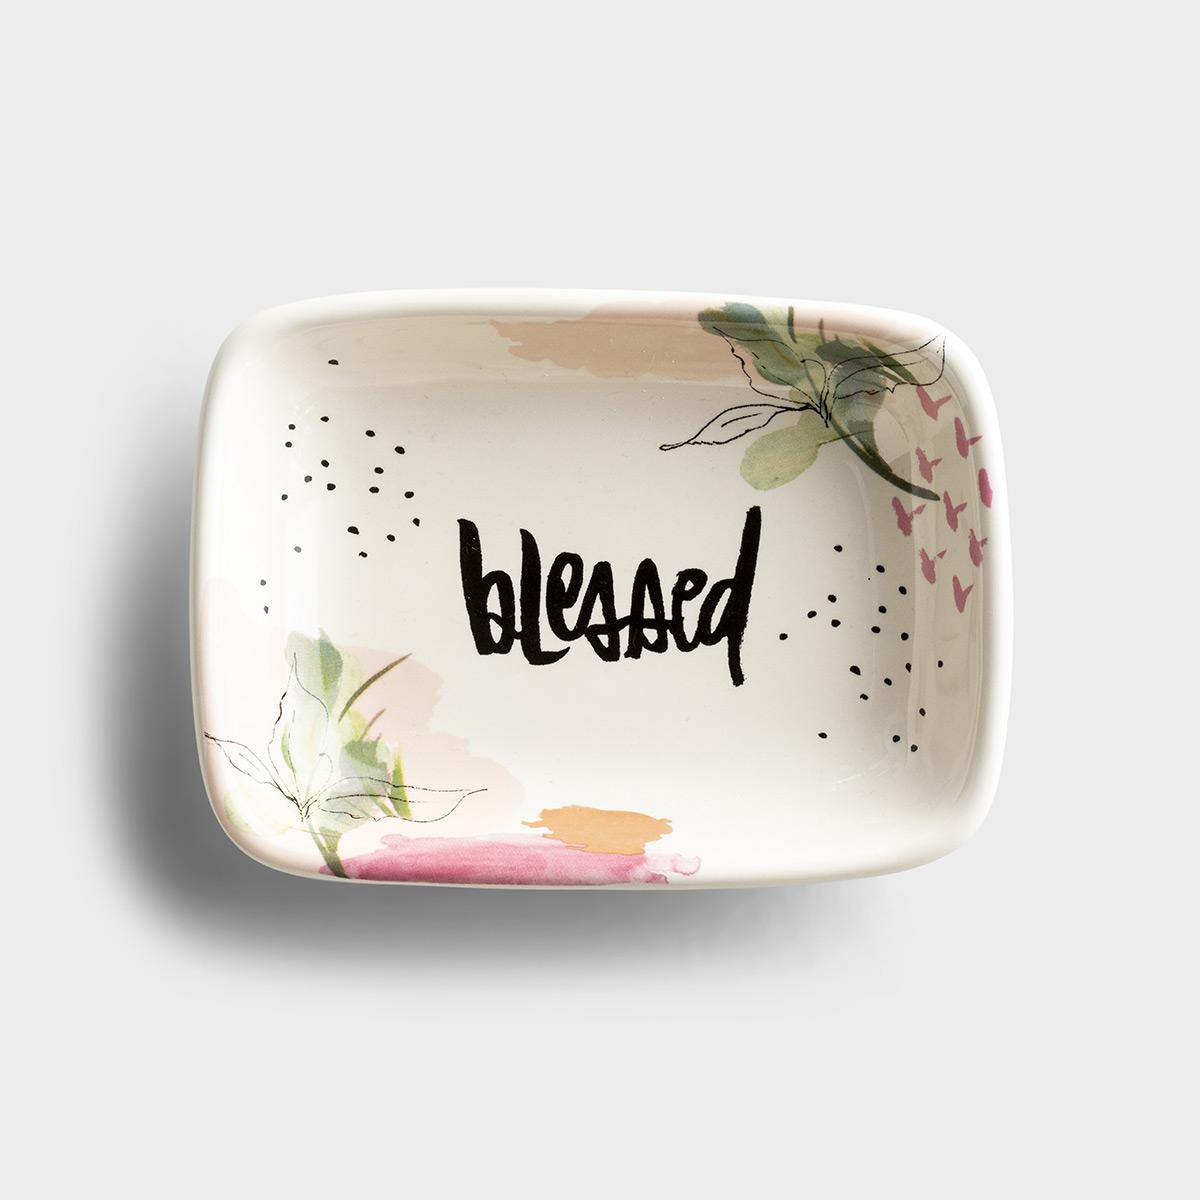 Katygirl - Blessed - Trinket Dish